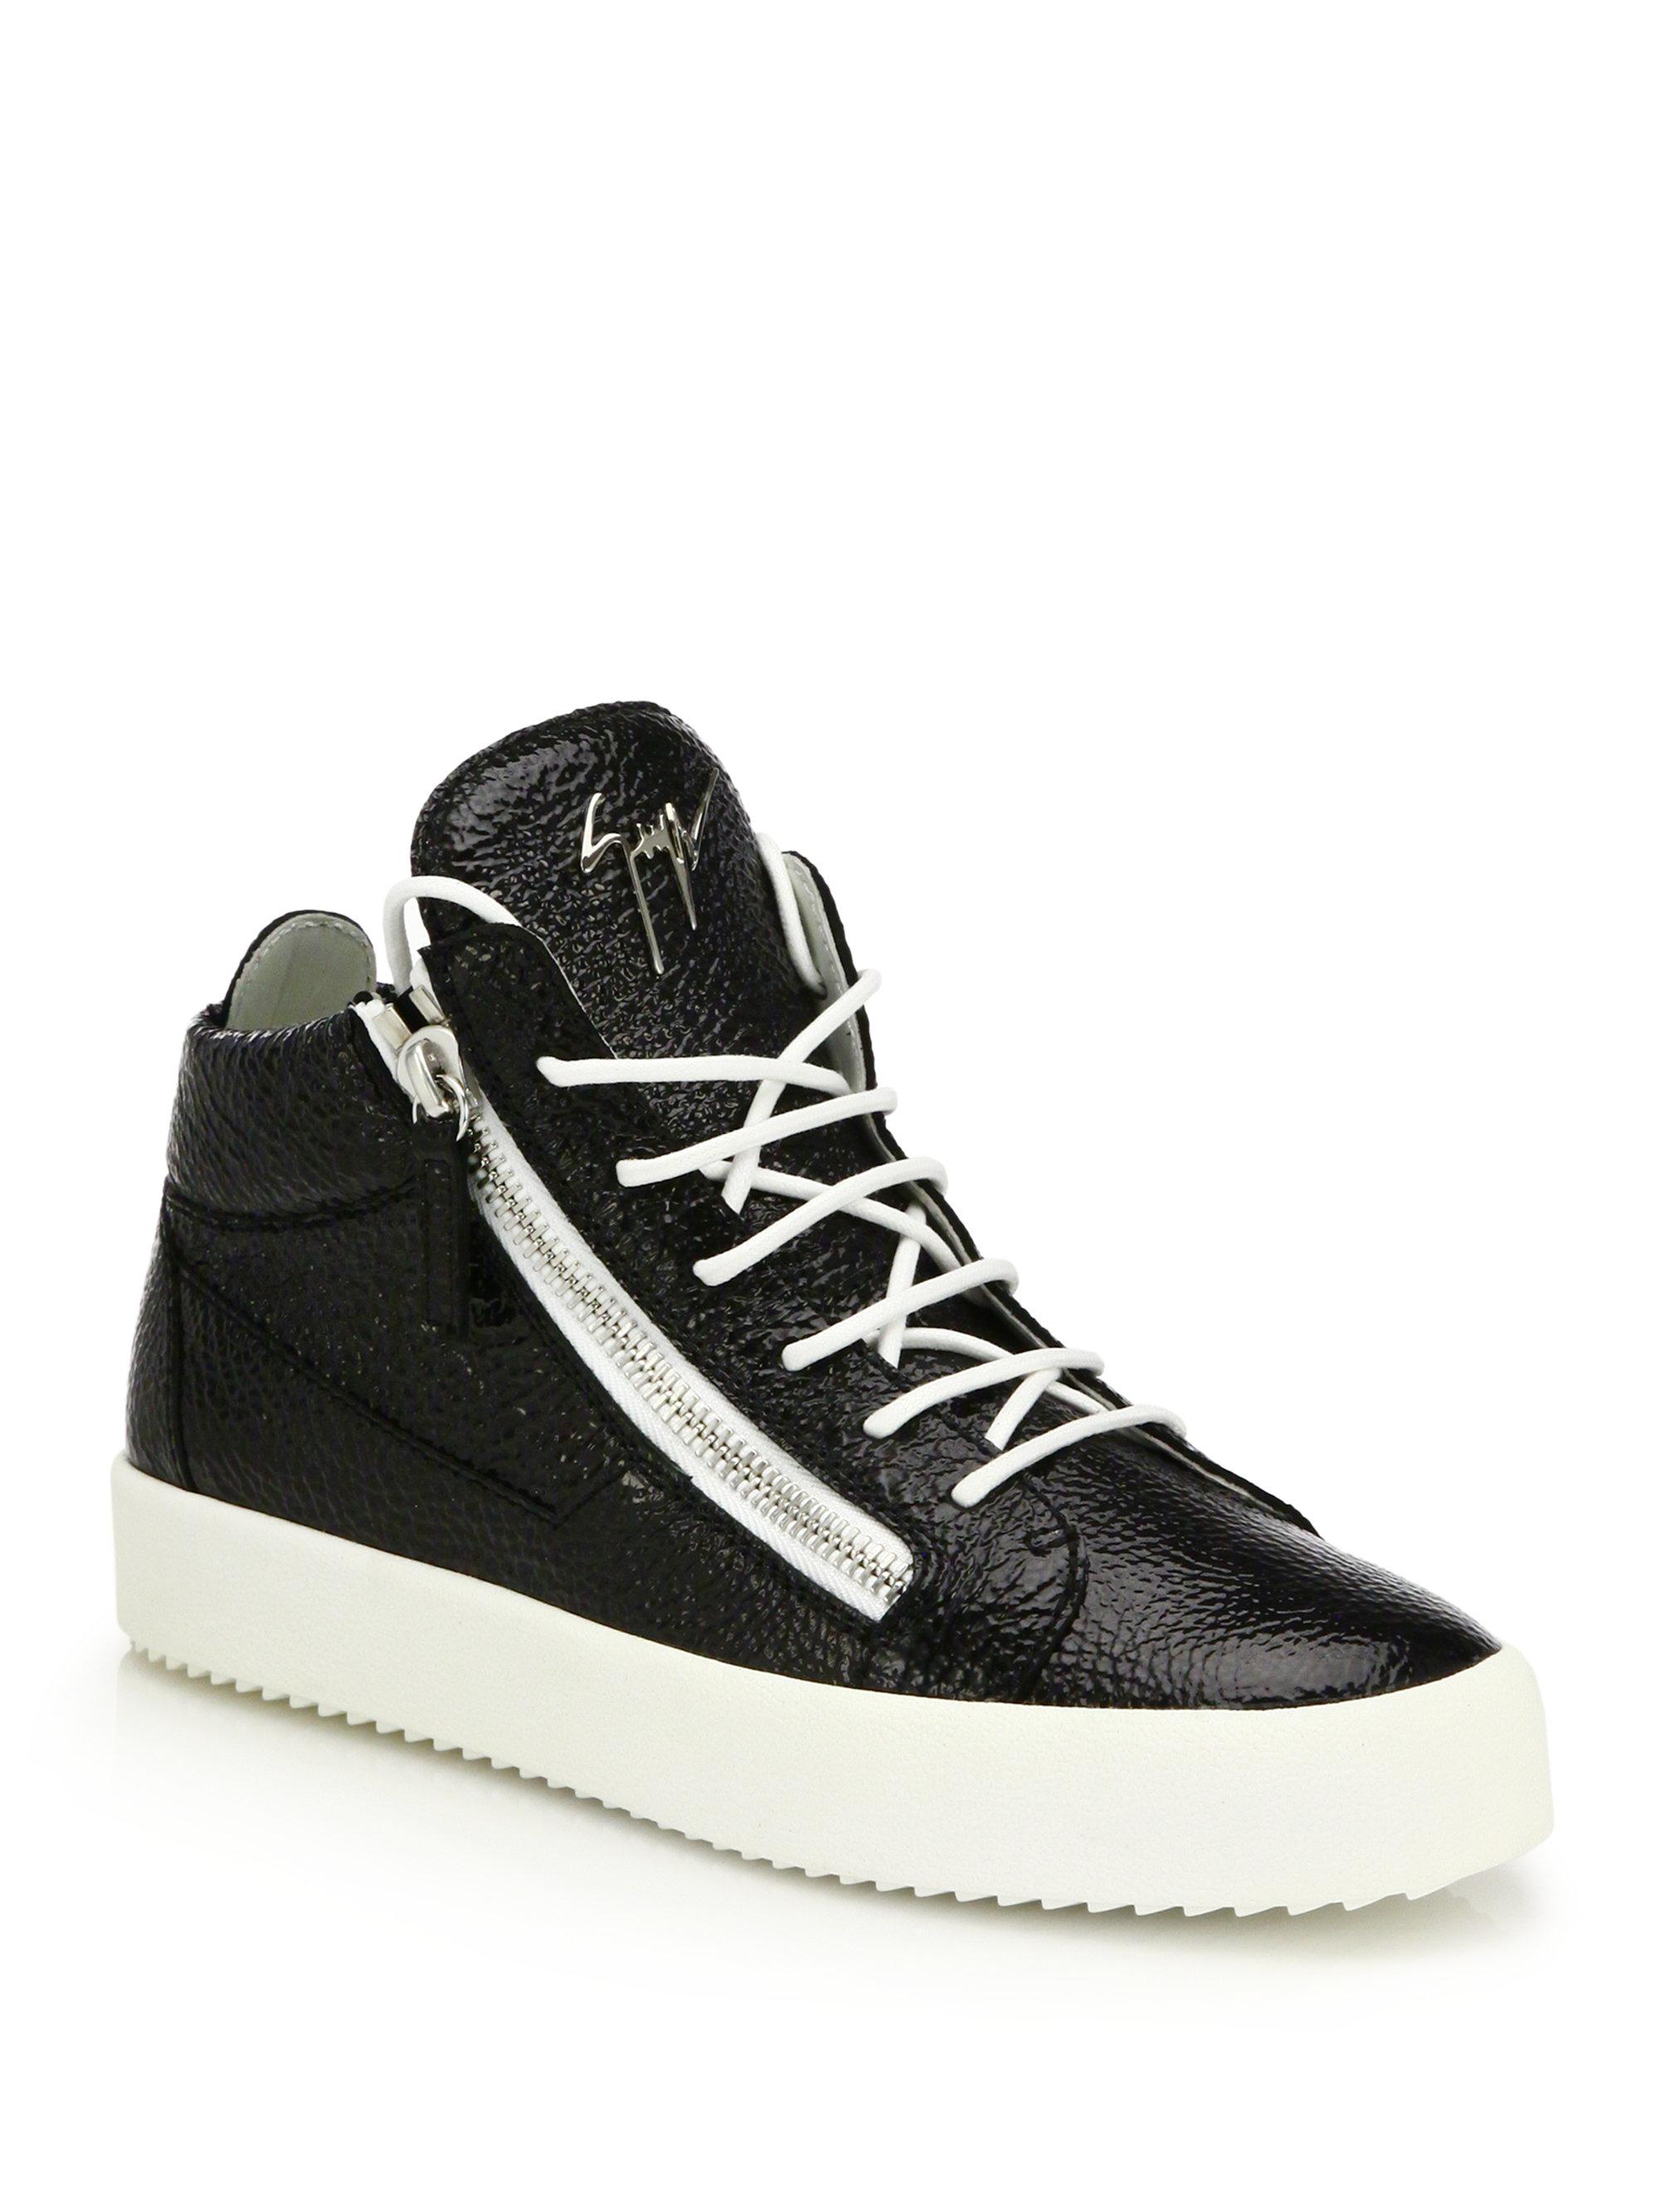 Mens Leather Double-Zip Mid-Top Sneakers Giuseppe Zanotti M0q26JjEE